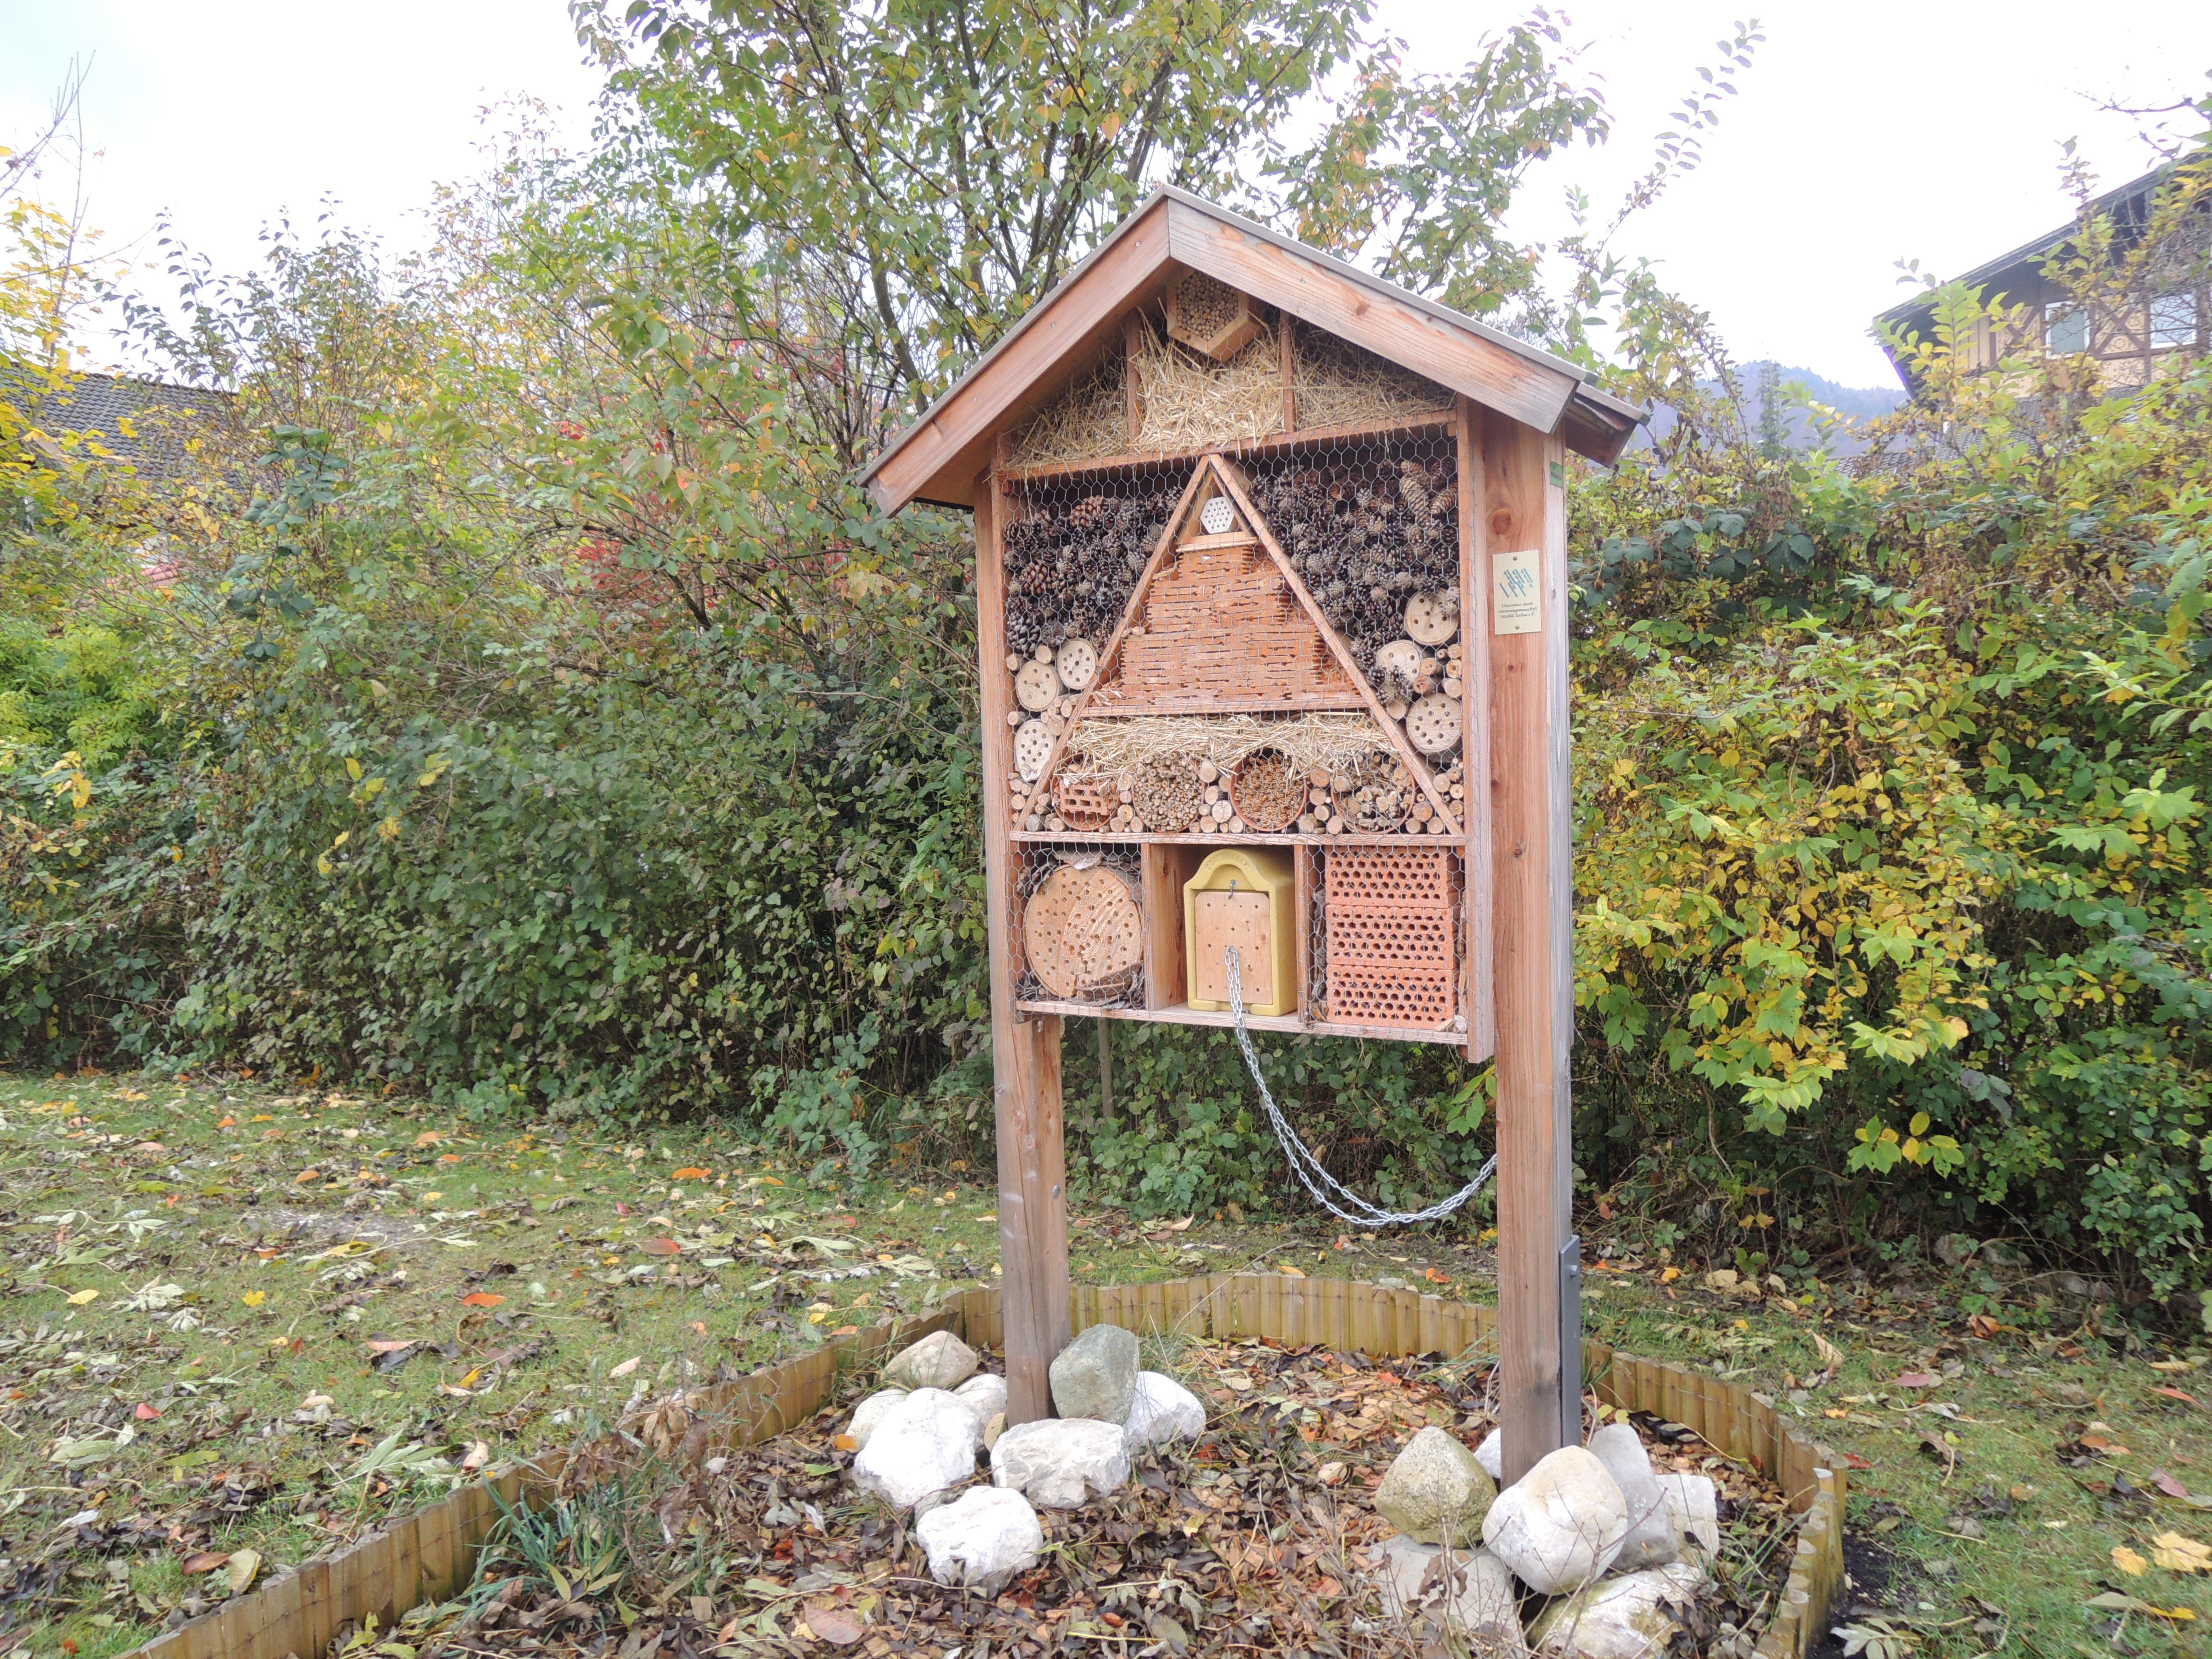 Insektenhotel auf dem Naturlehrpfad